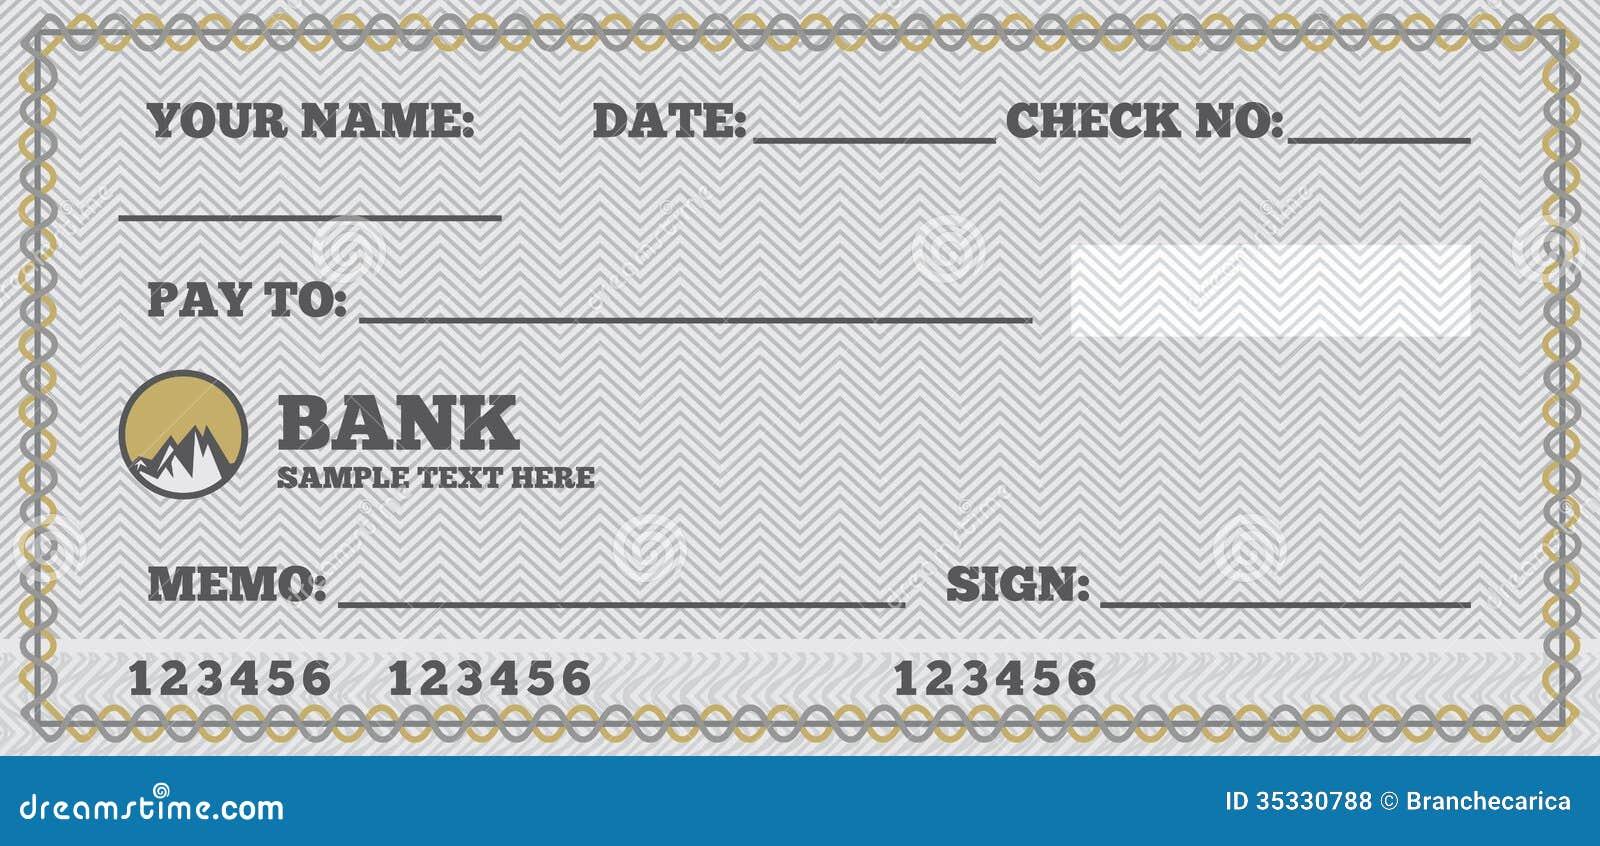 blank check royalty free stock photos  image 35330788